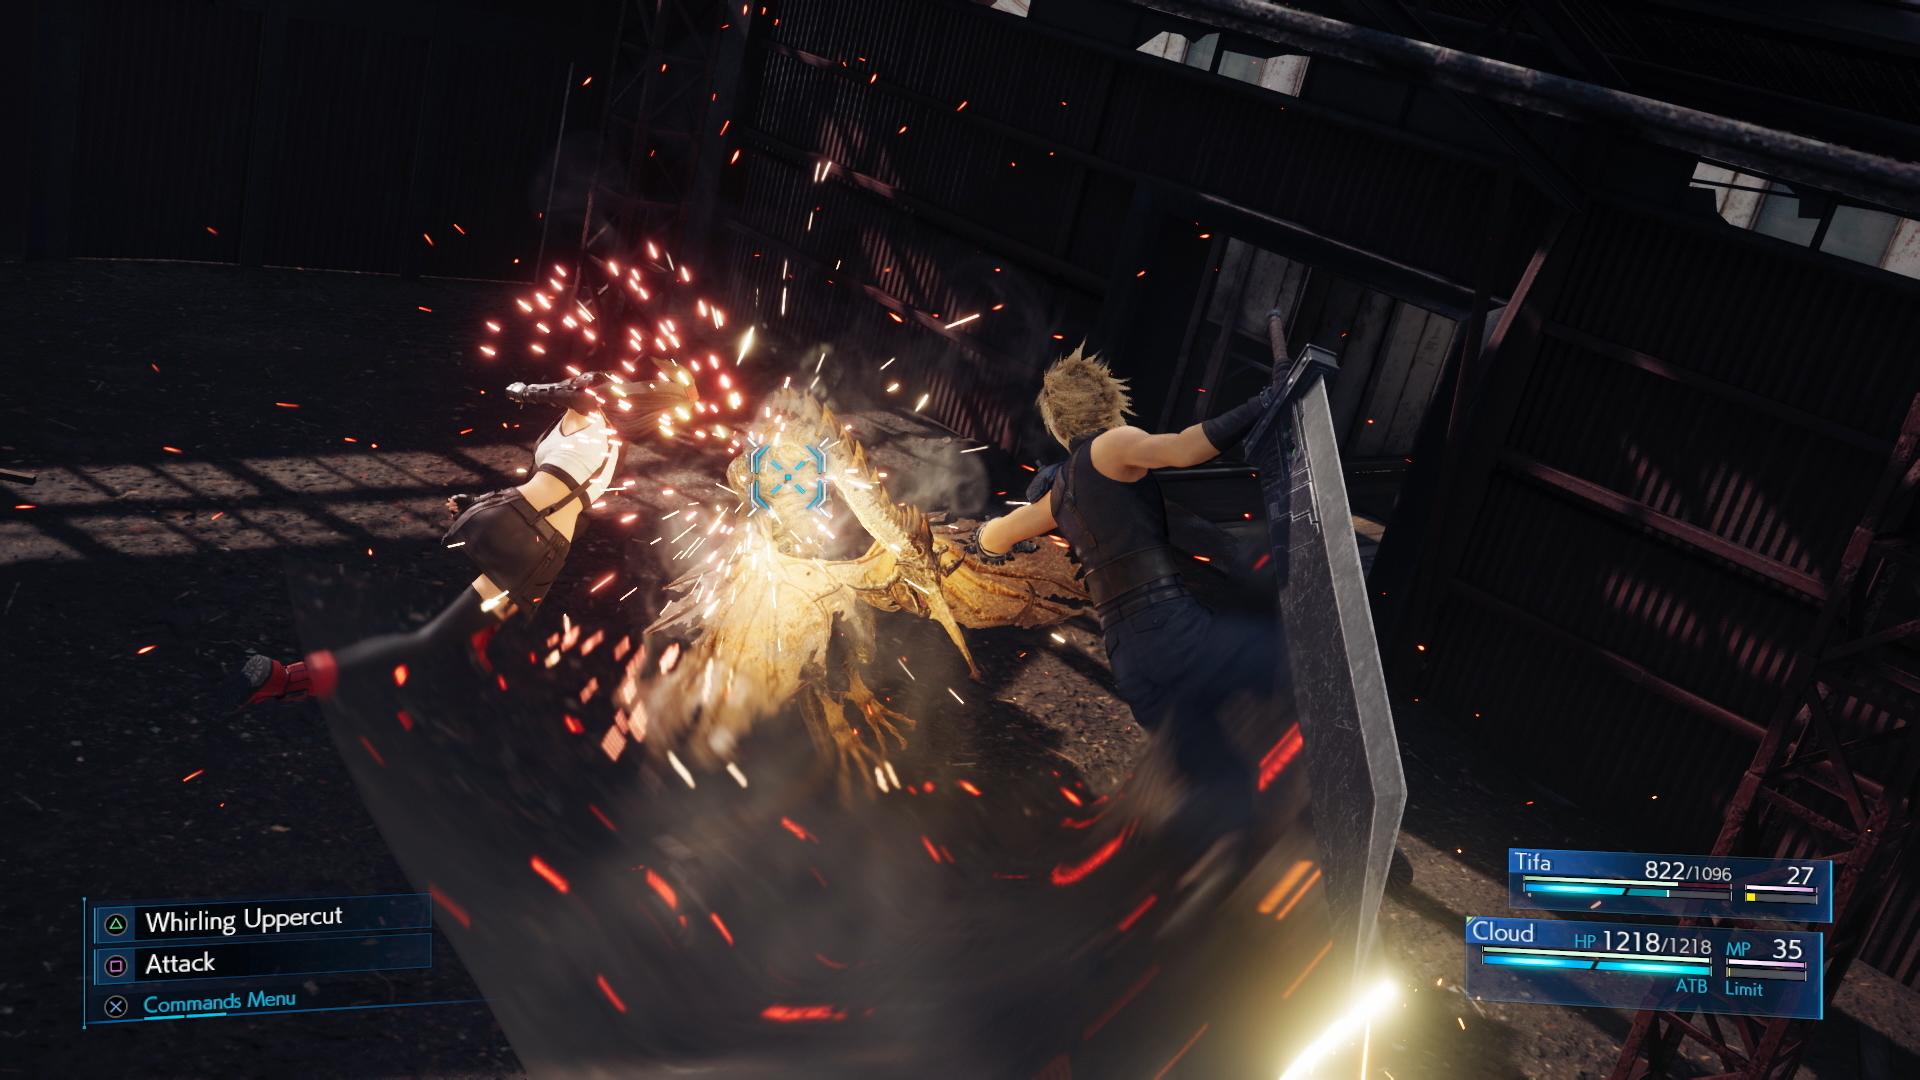 A screenshot from Final Fantasy VII Remake